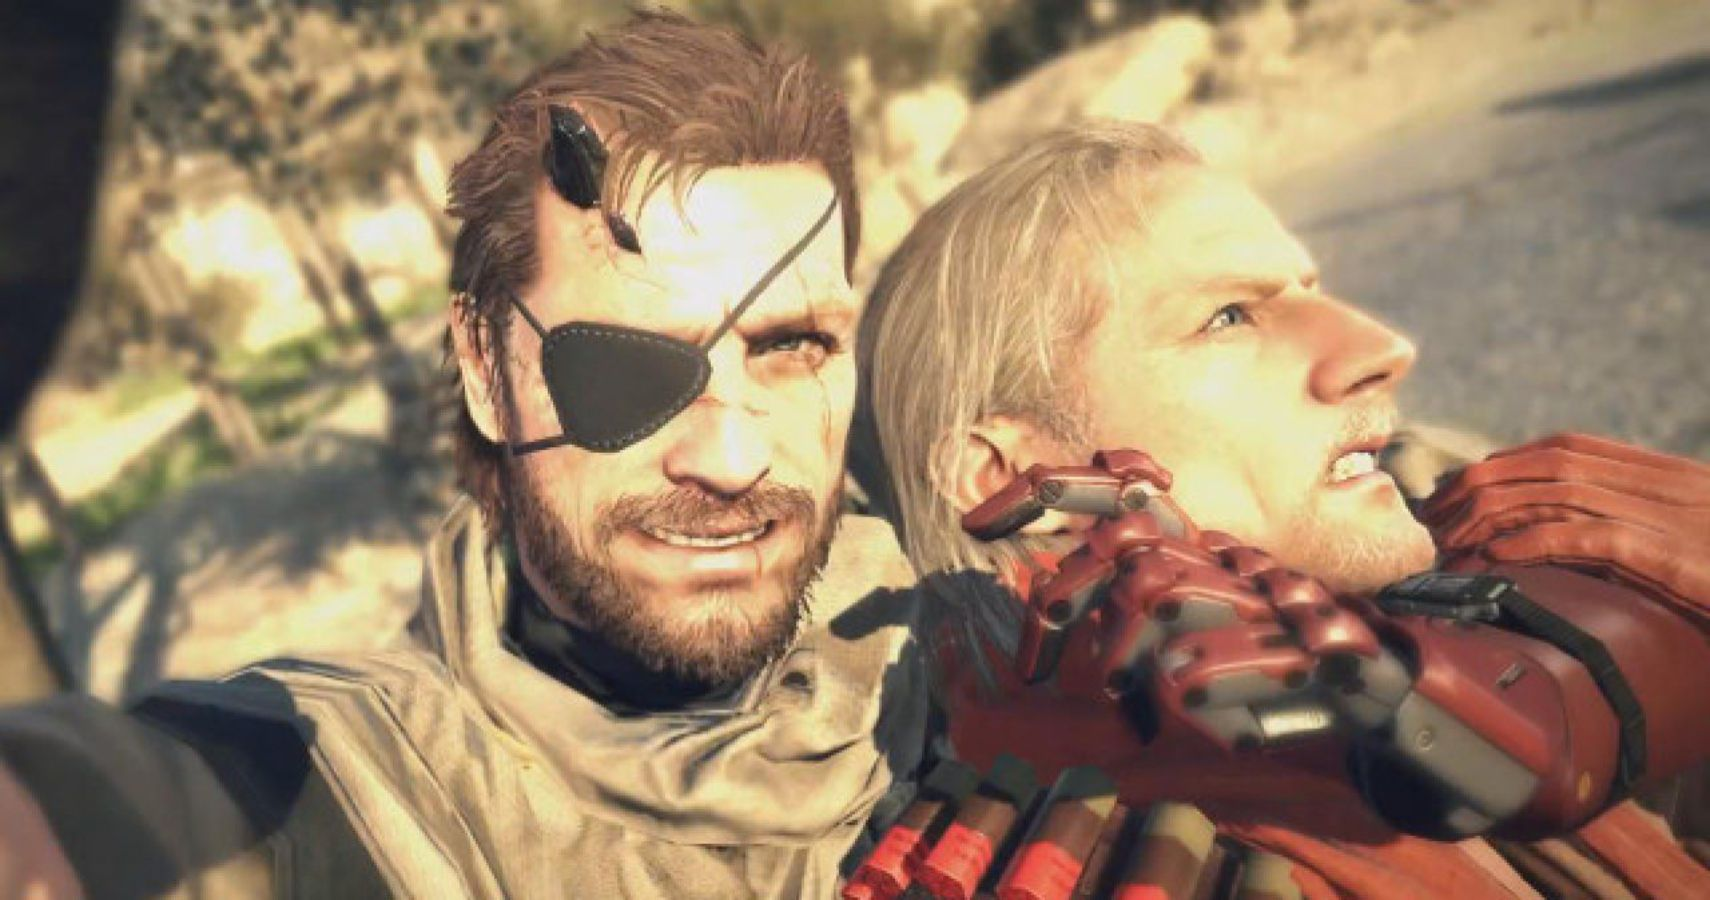 10 Hilarious Metal Gear Solid 5 Memes Only True Fans Understand